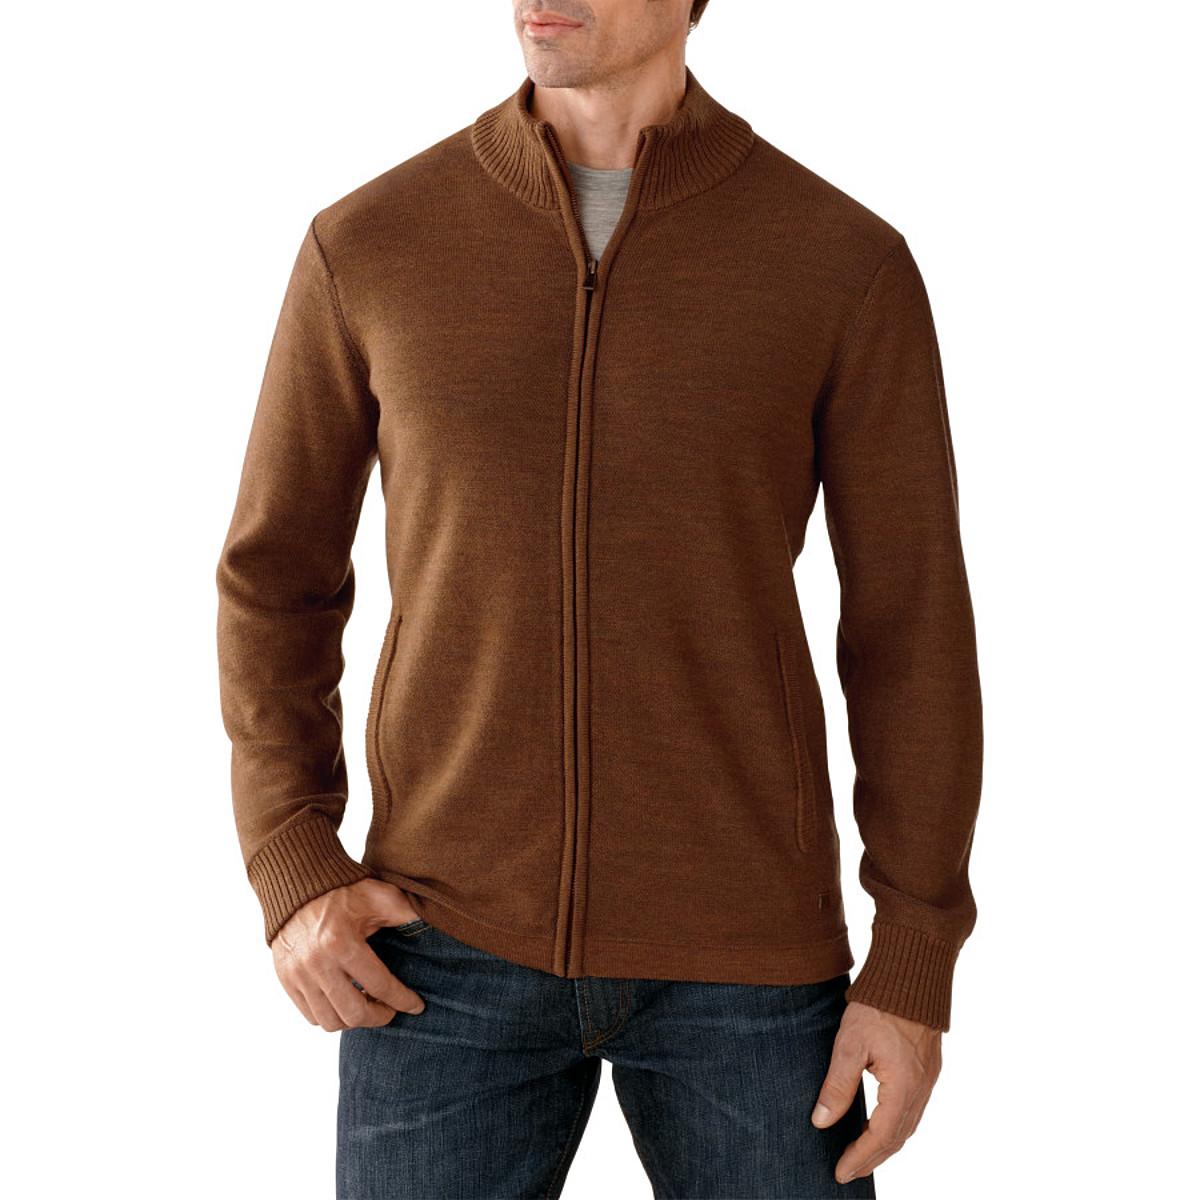 Smartwool Pioneer Ridge Full-Zip Sweater